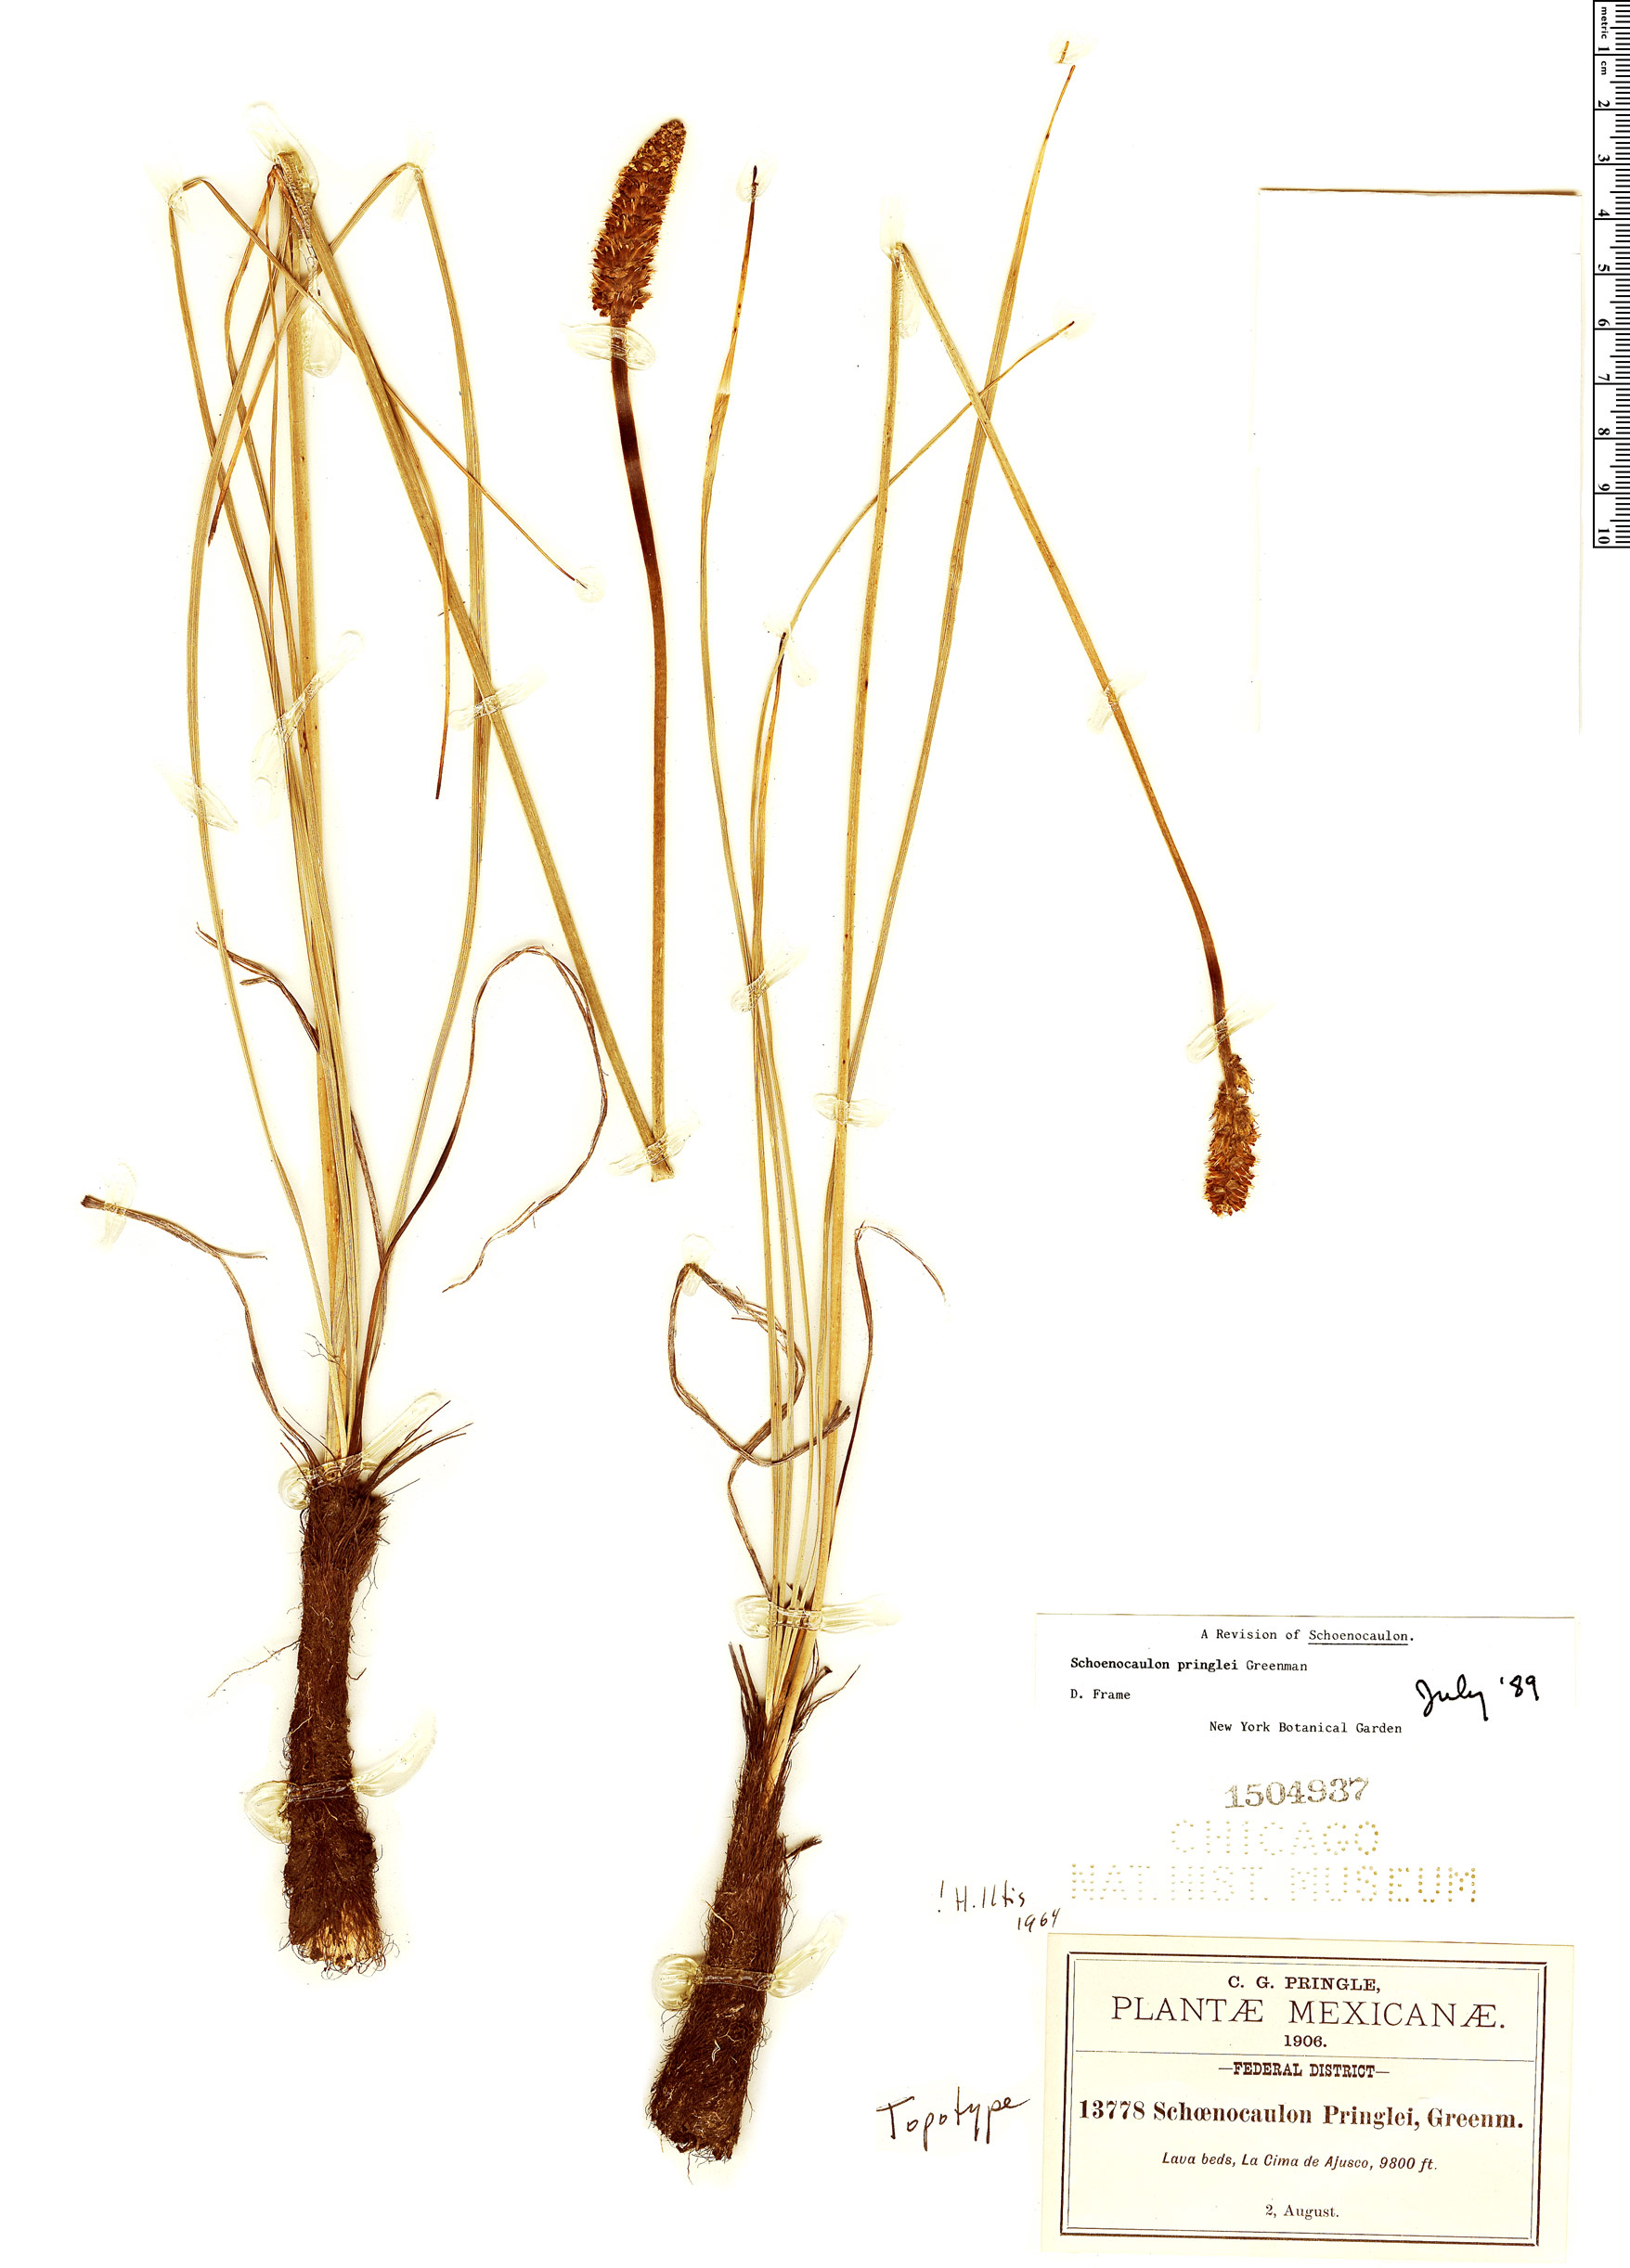 Specimen: Schoenocaulon pringlei